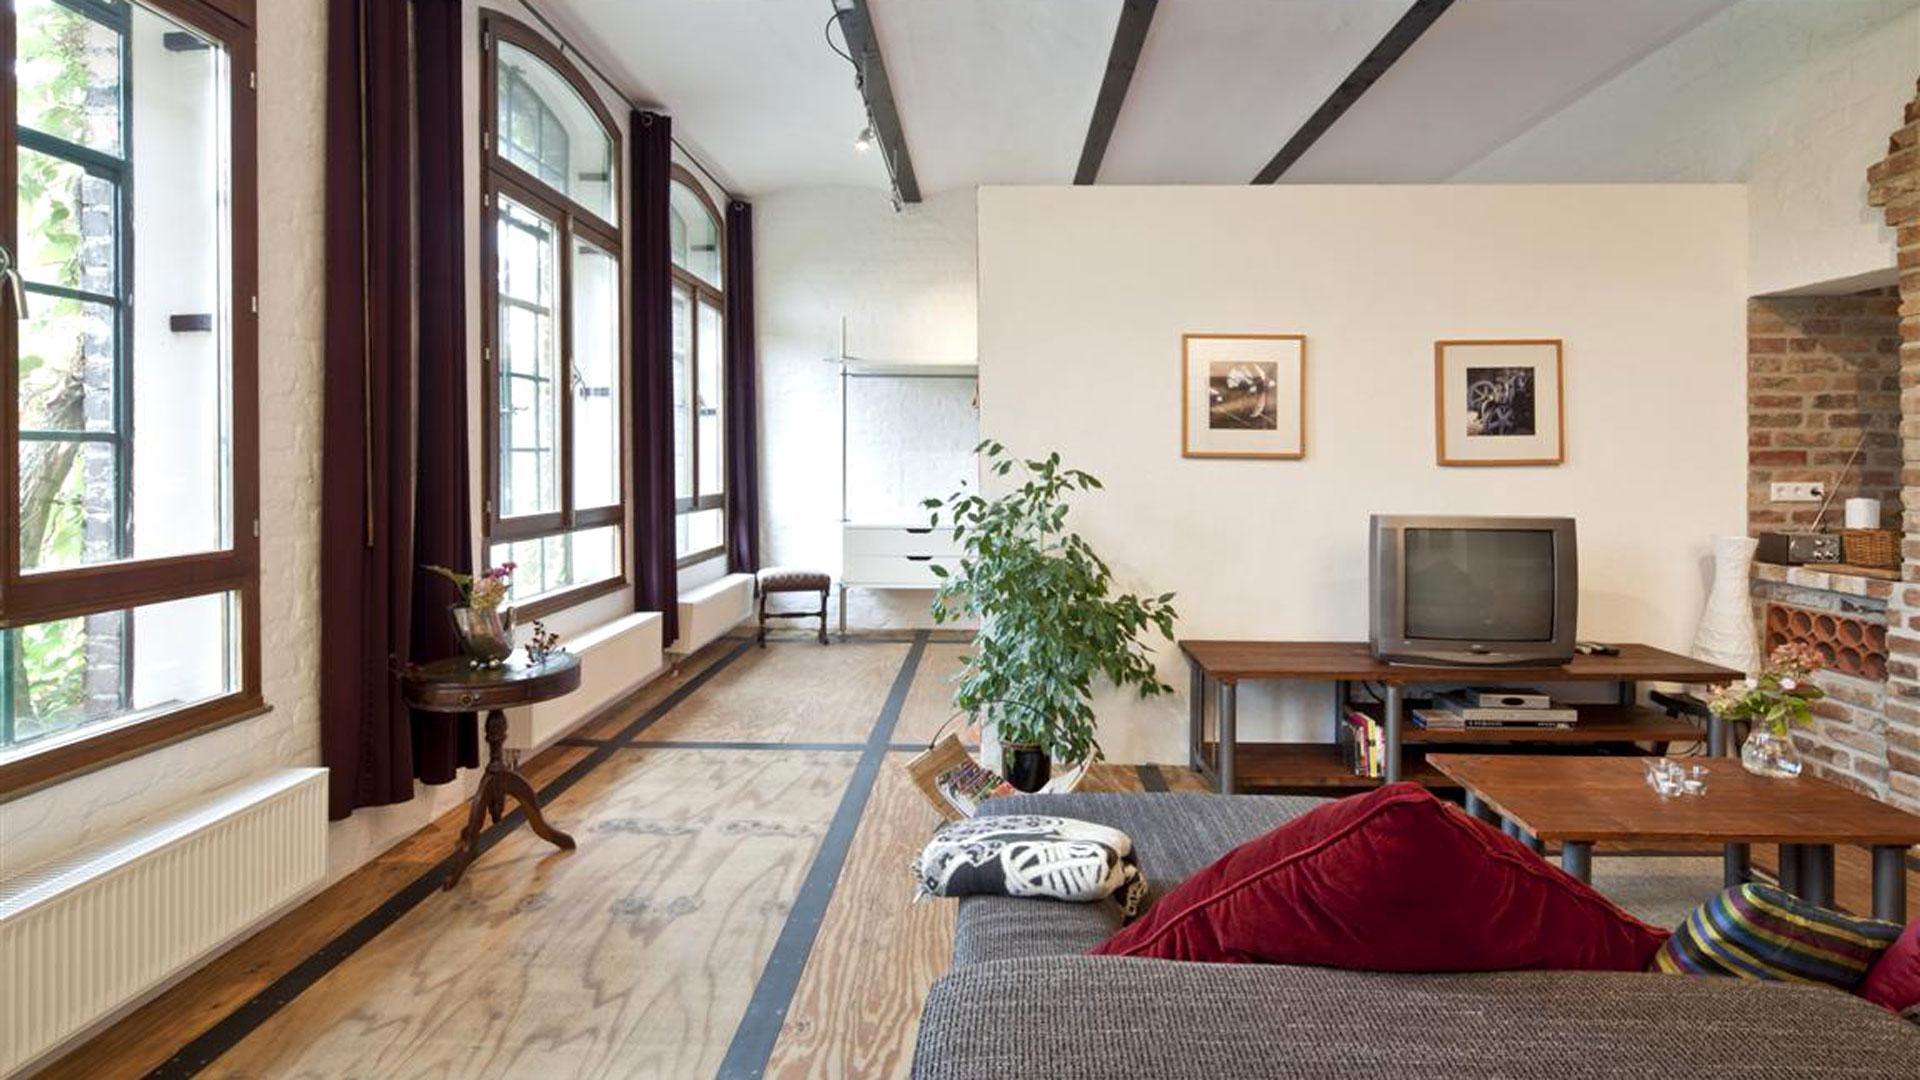 Loft, Wohnraum 1, Foto: Sonja Speck